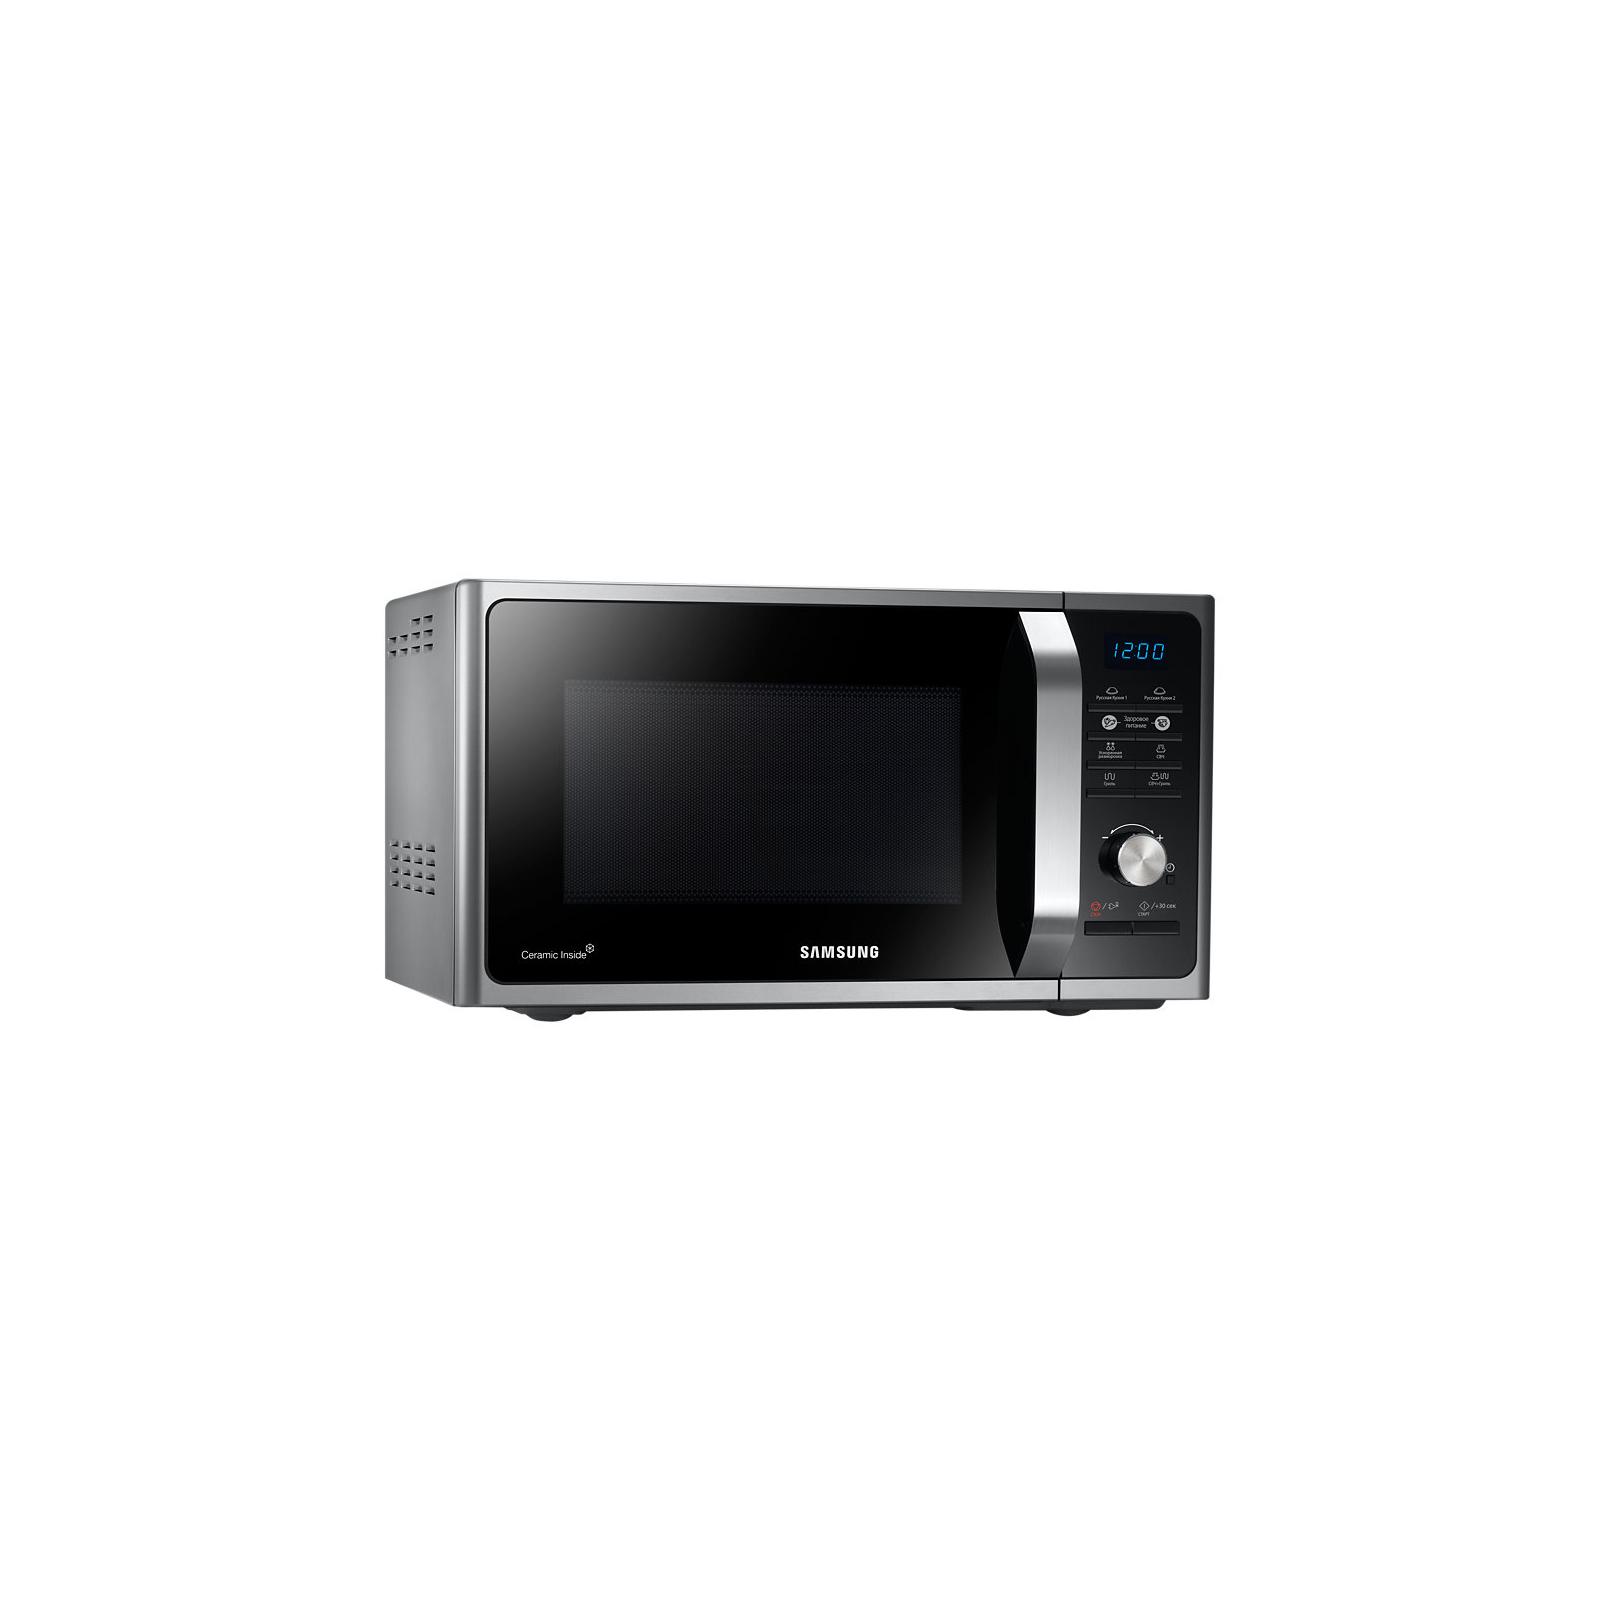 Микроволновая печь Samsung MS 23 F 302 TAK/BW (MS23F302TAK/BW) изображение 3